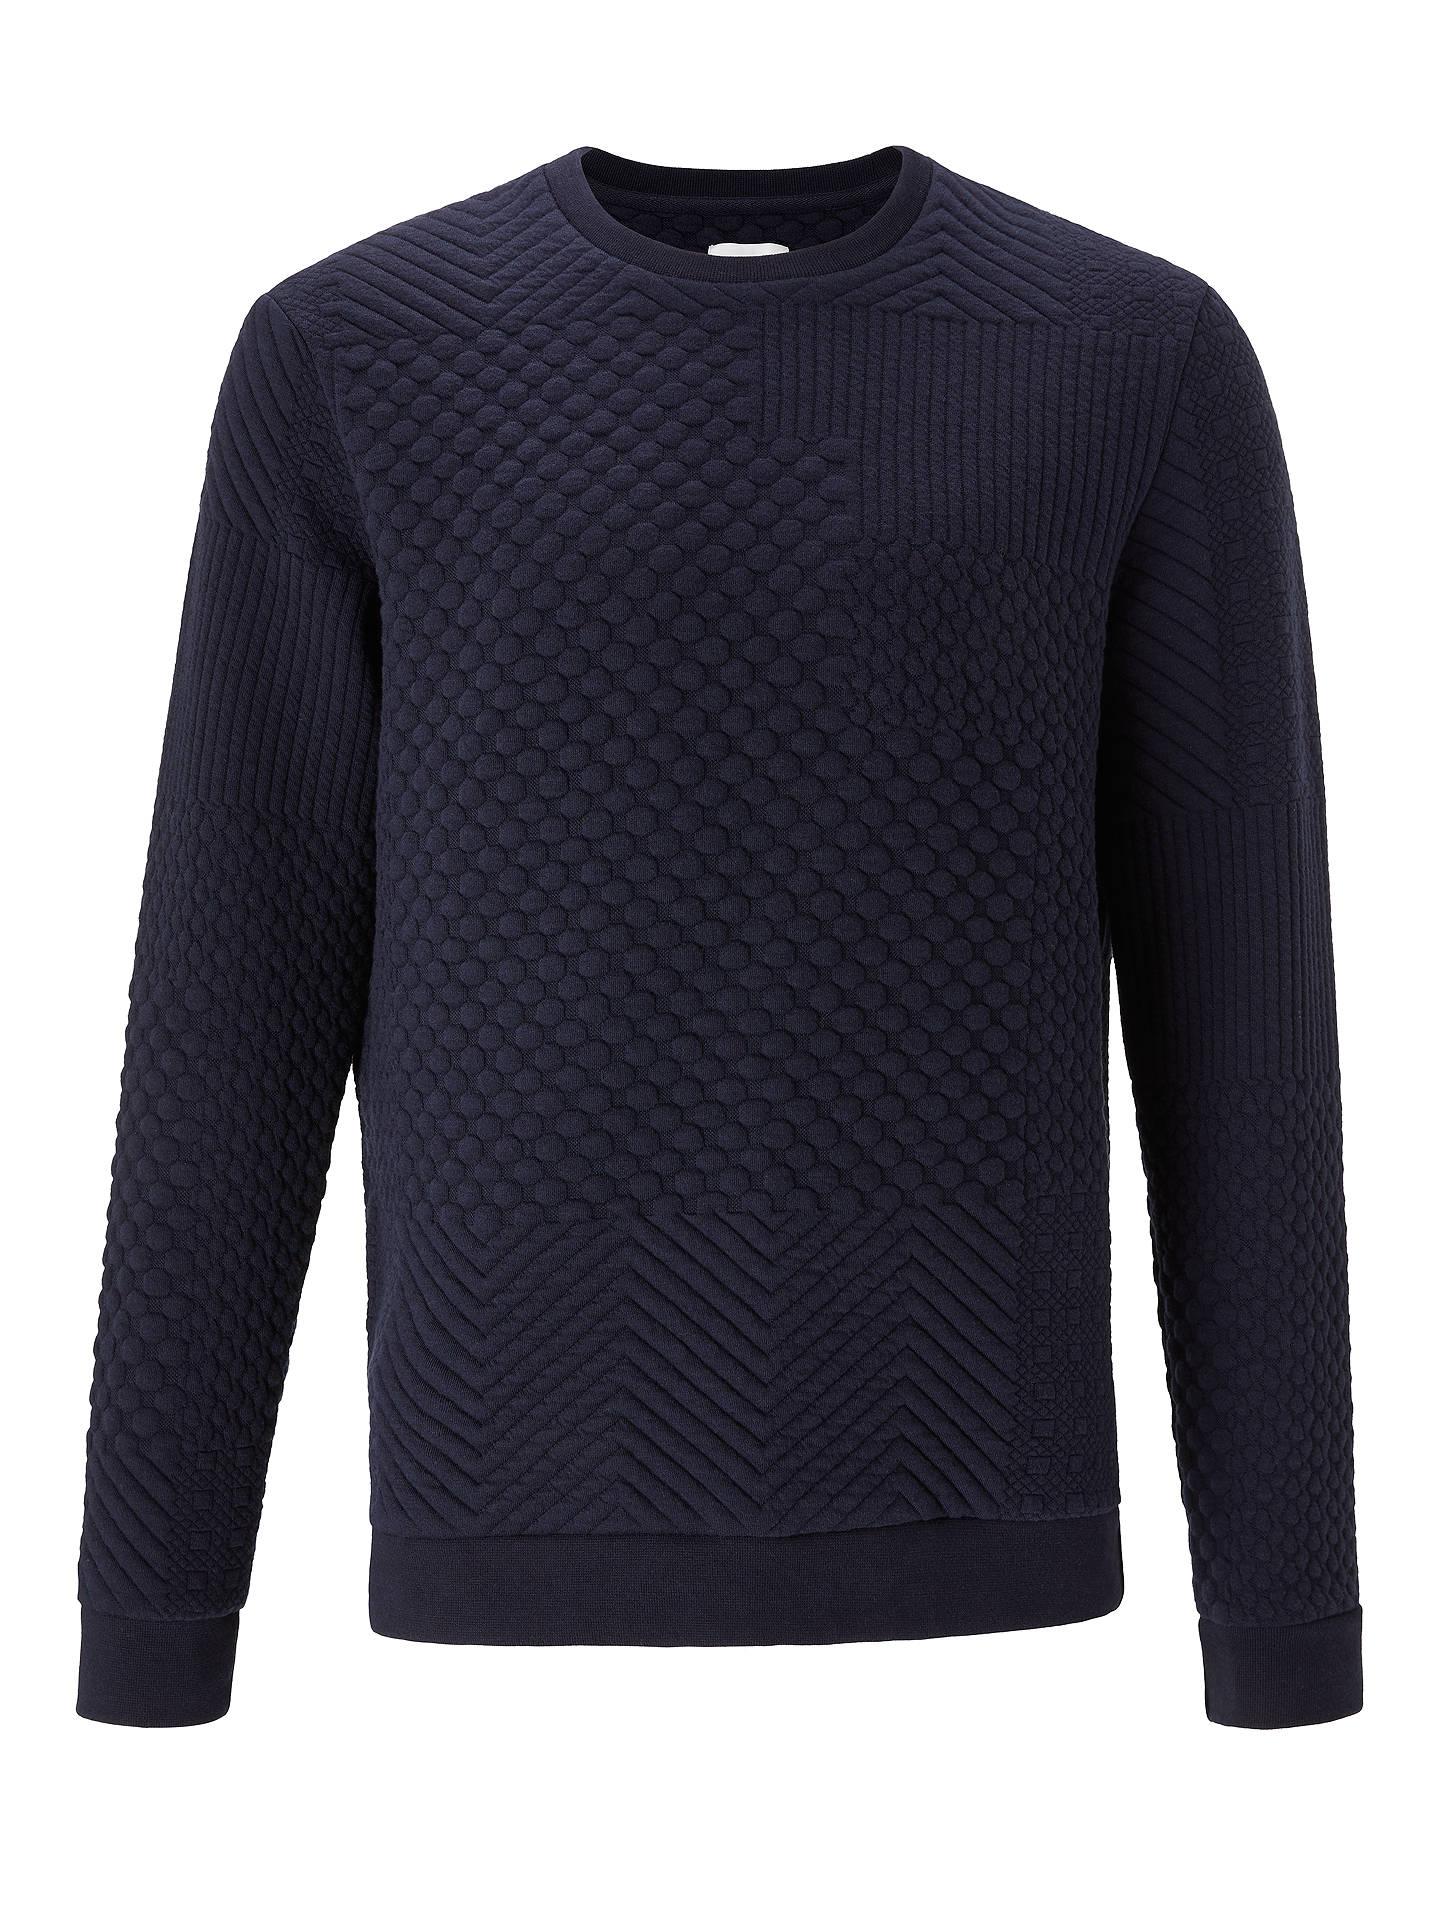 Tee Shirt Sweatshirt Design Quilting Evolution T Shirt